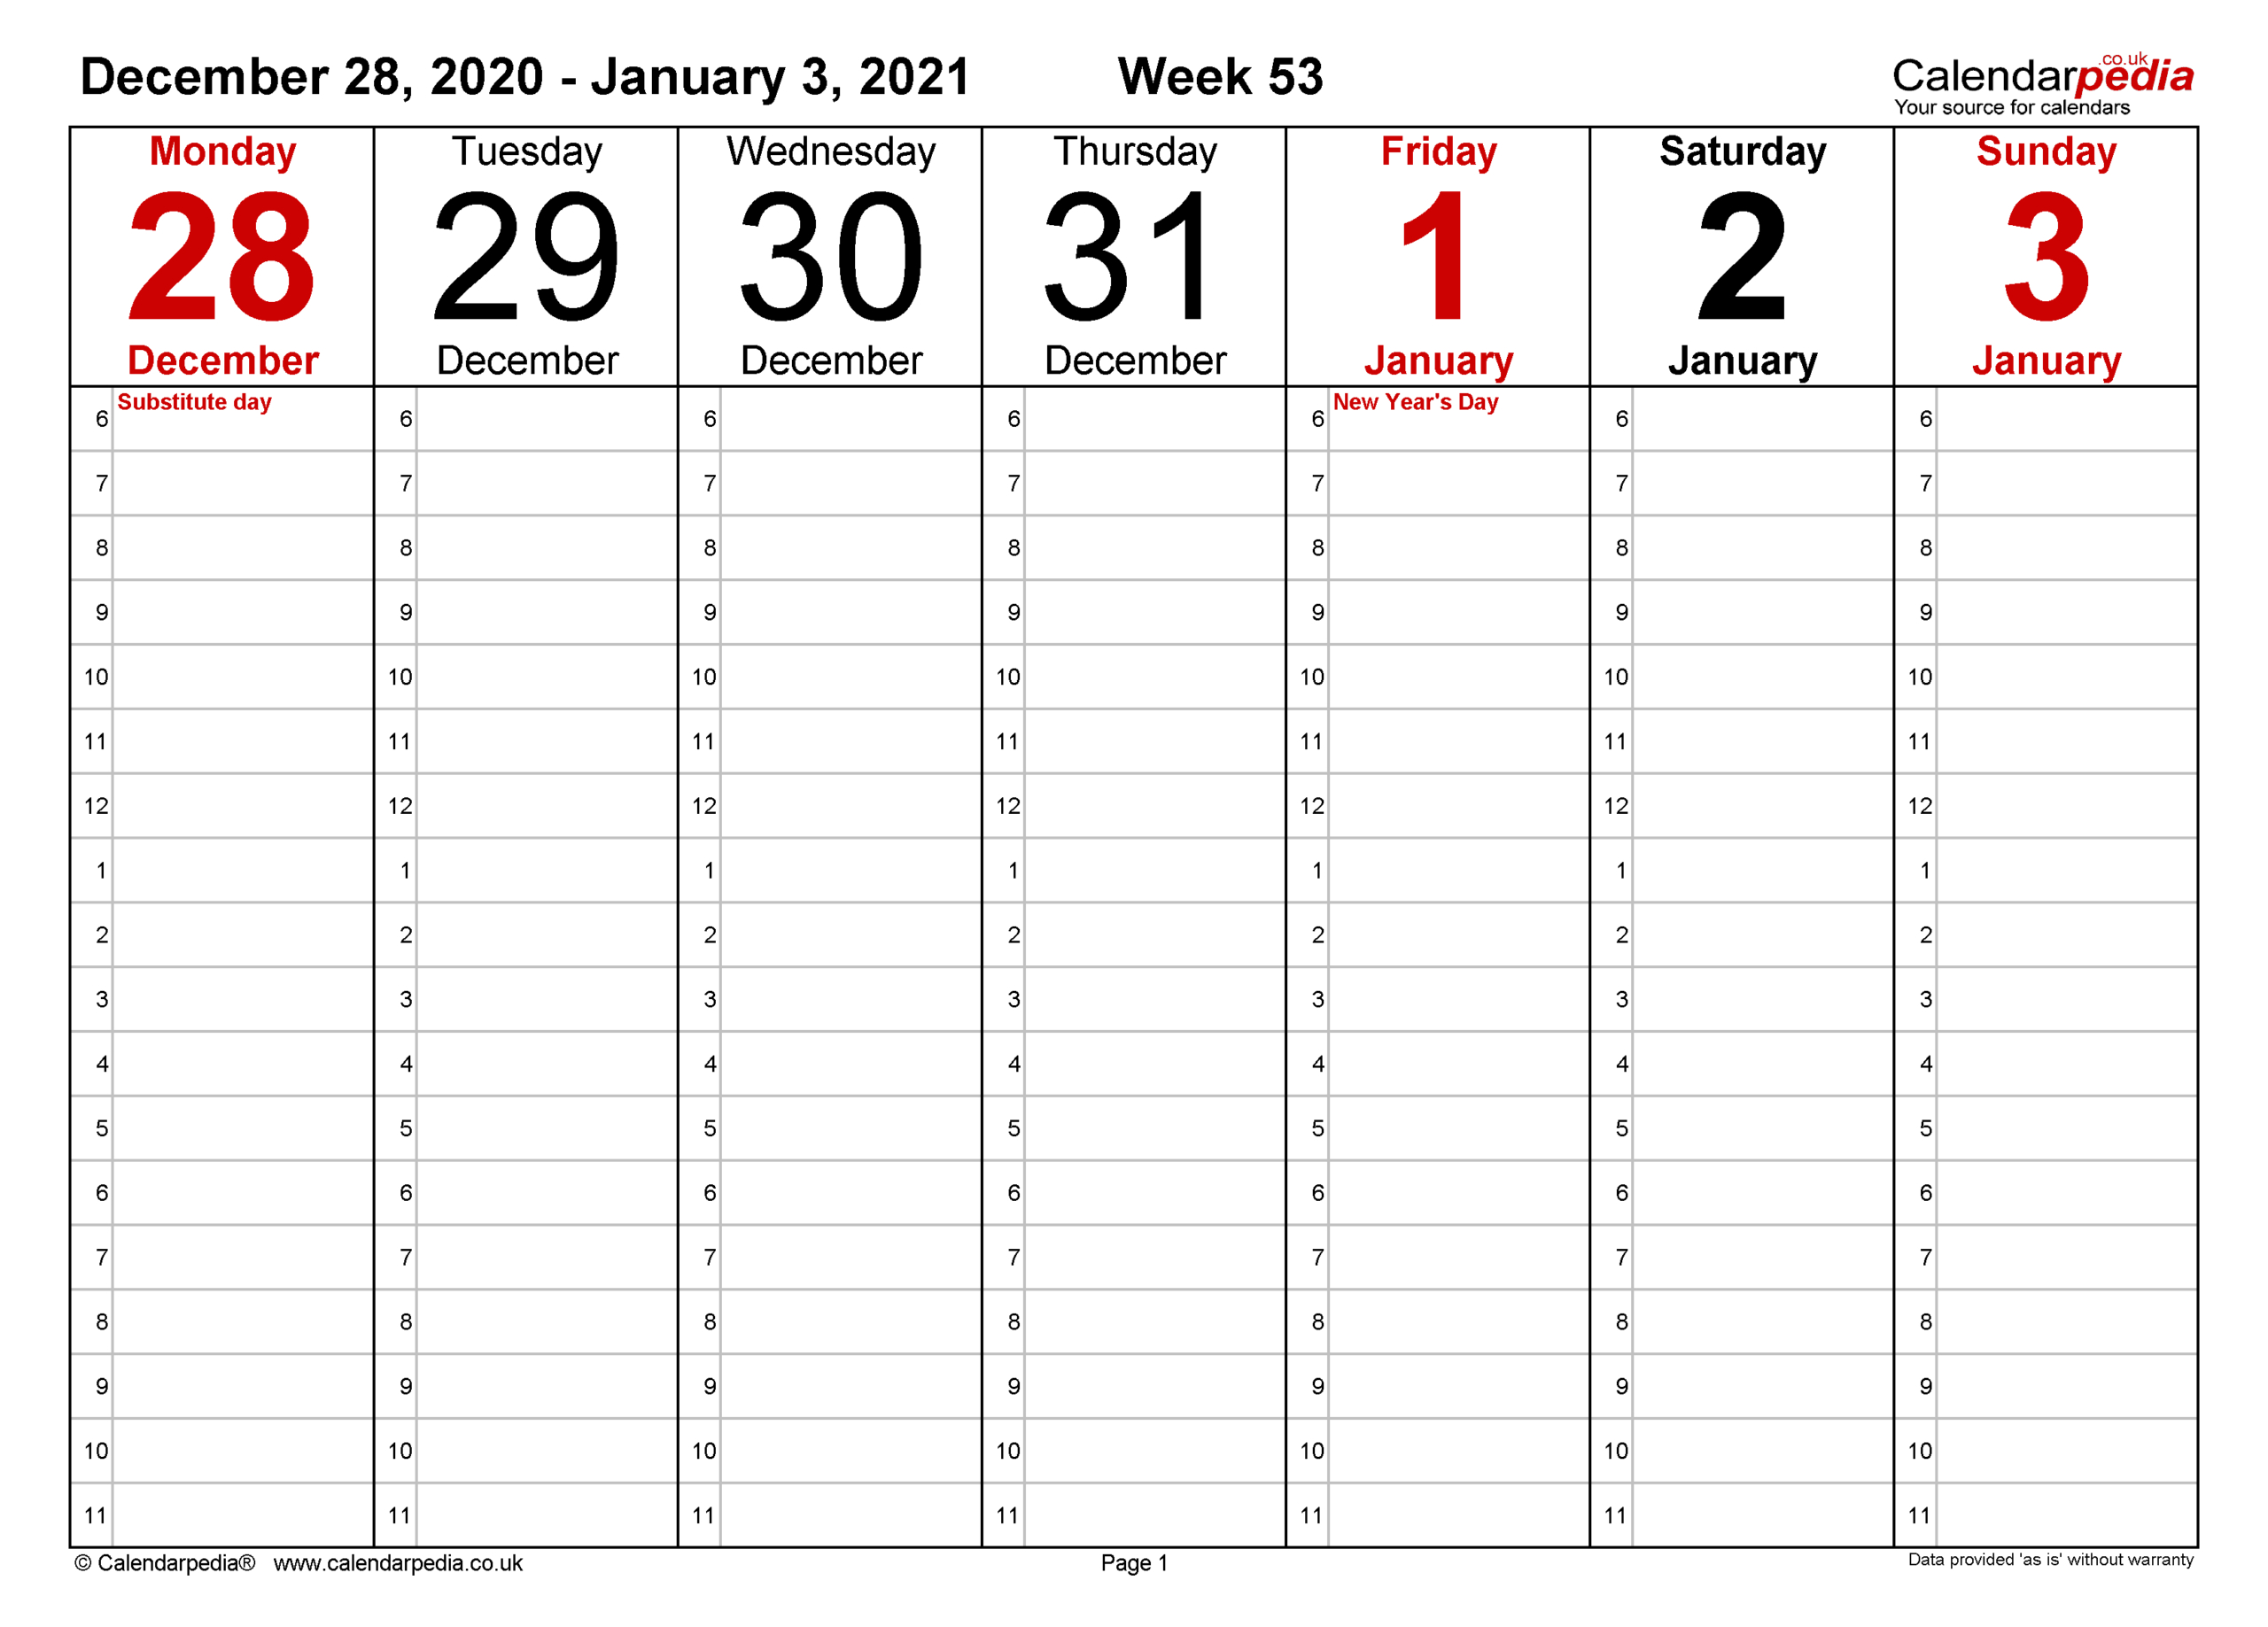 Free Print 2021 Calendars Without Downloading | Calendar  Fillable 2021 Calendar Template